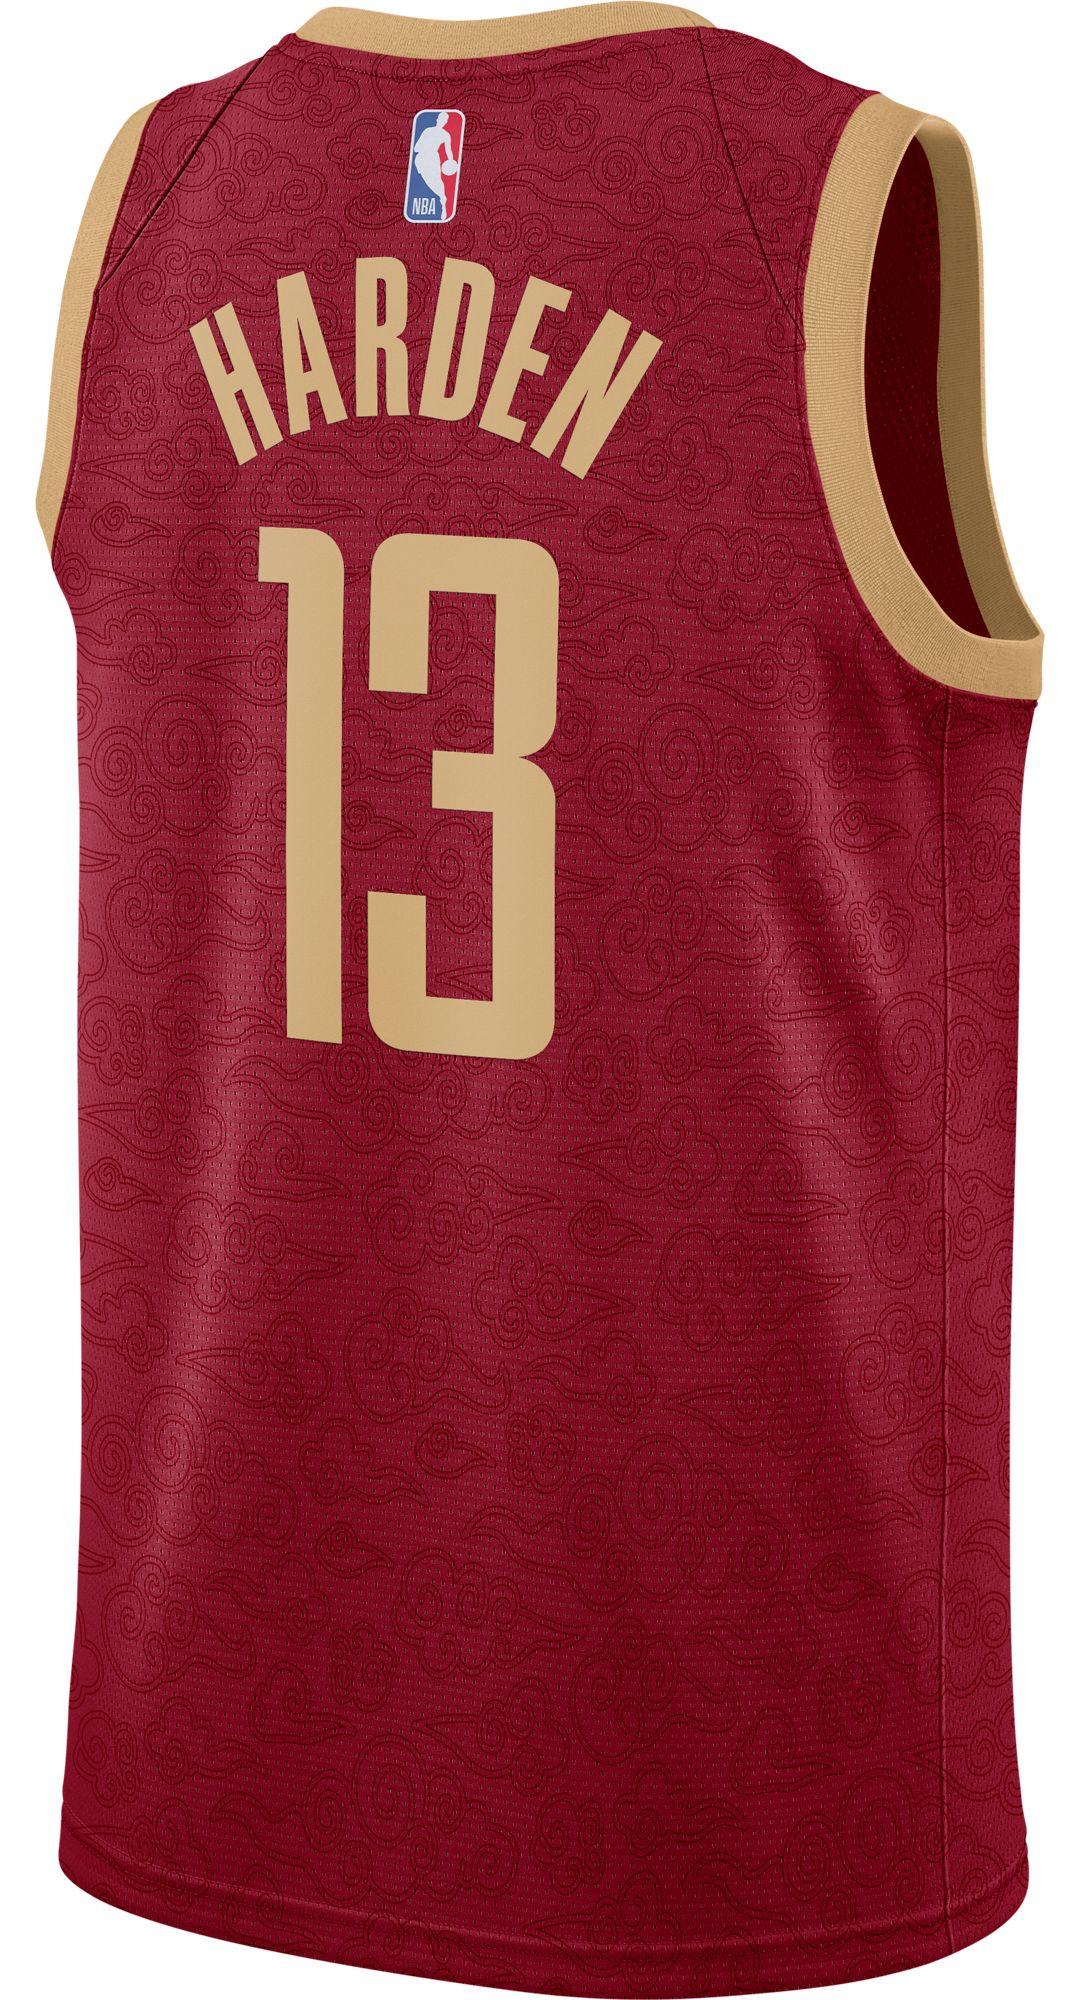 5b416197d Nike Men's Houston Rockets James Harden Dri-FIT City Edition Swingman Jersey.  noImageFound. Previous. 1. 2. 3